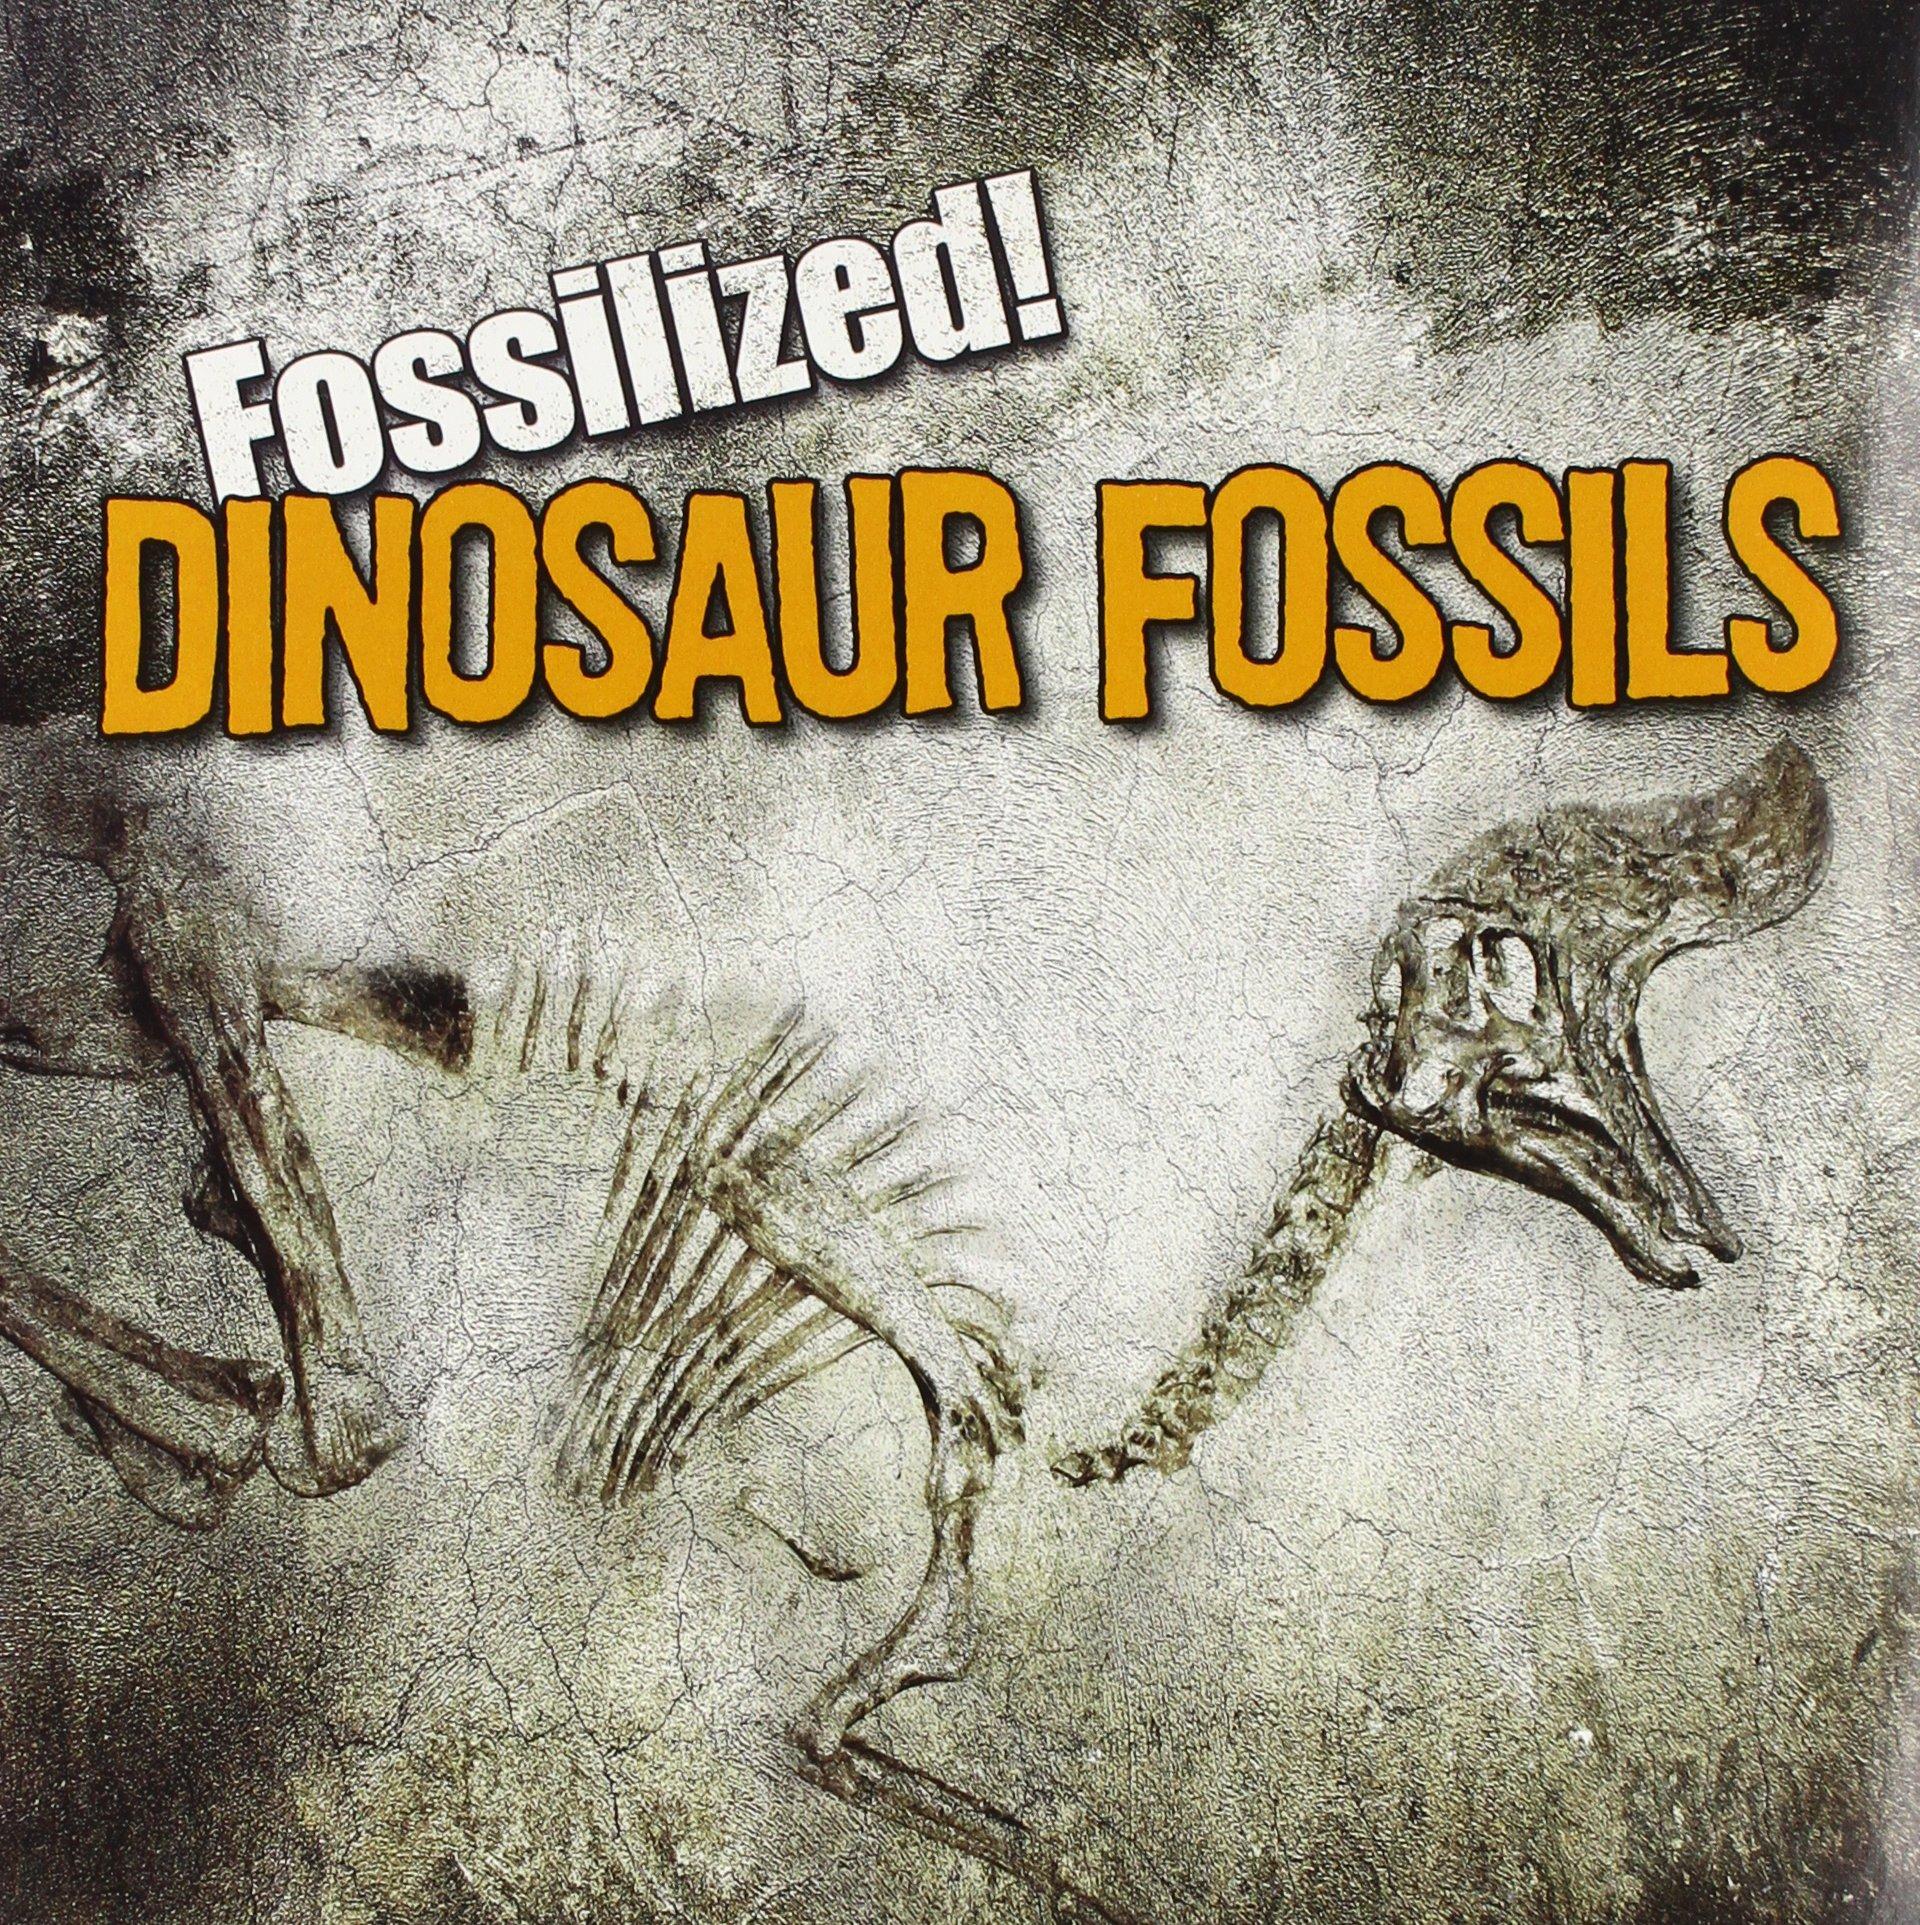 Dinosaur Fossils (Fossilized!)